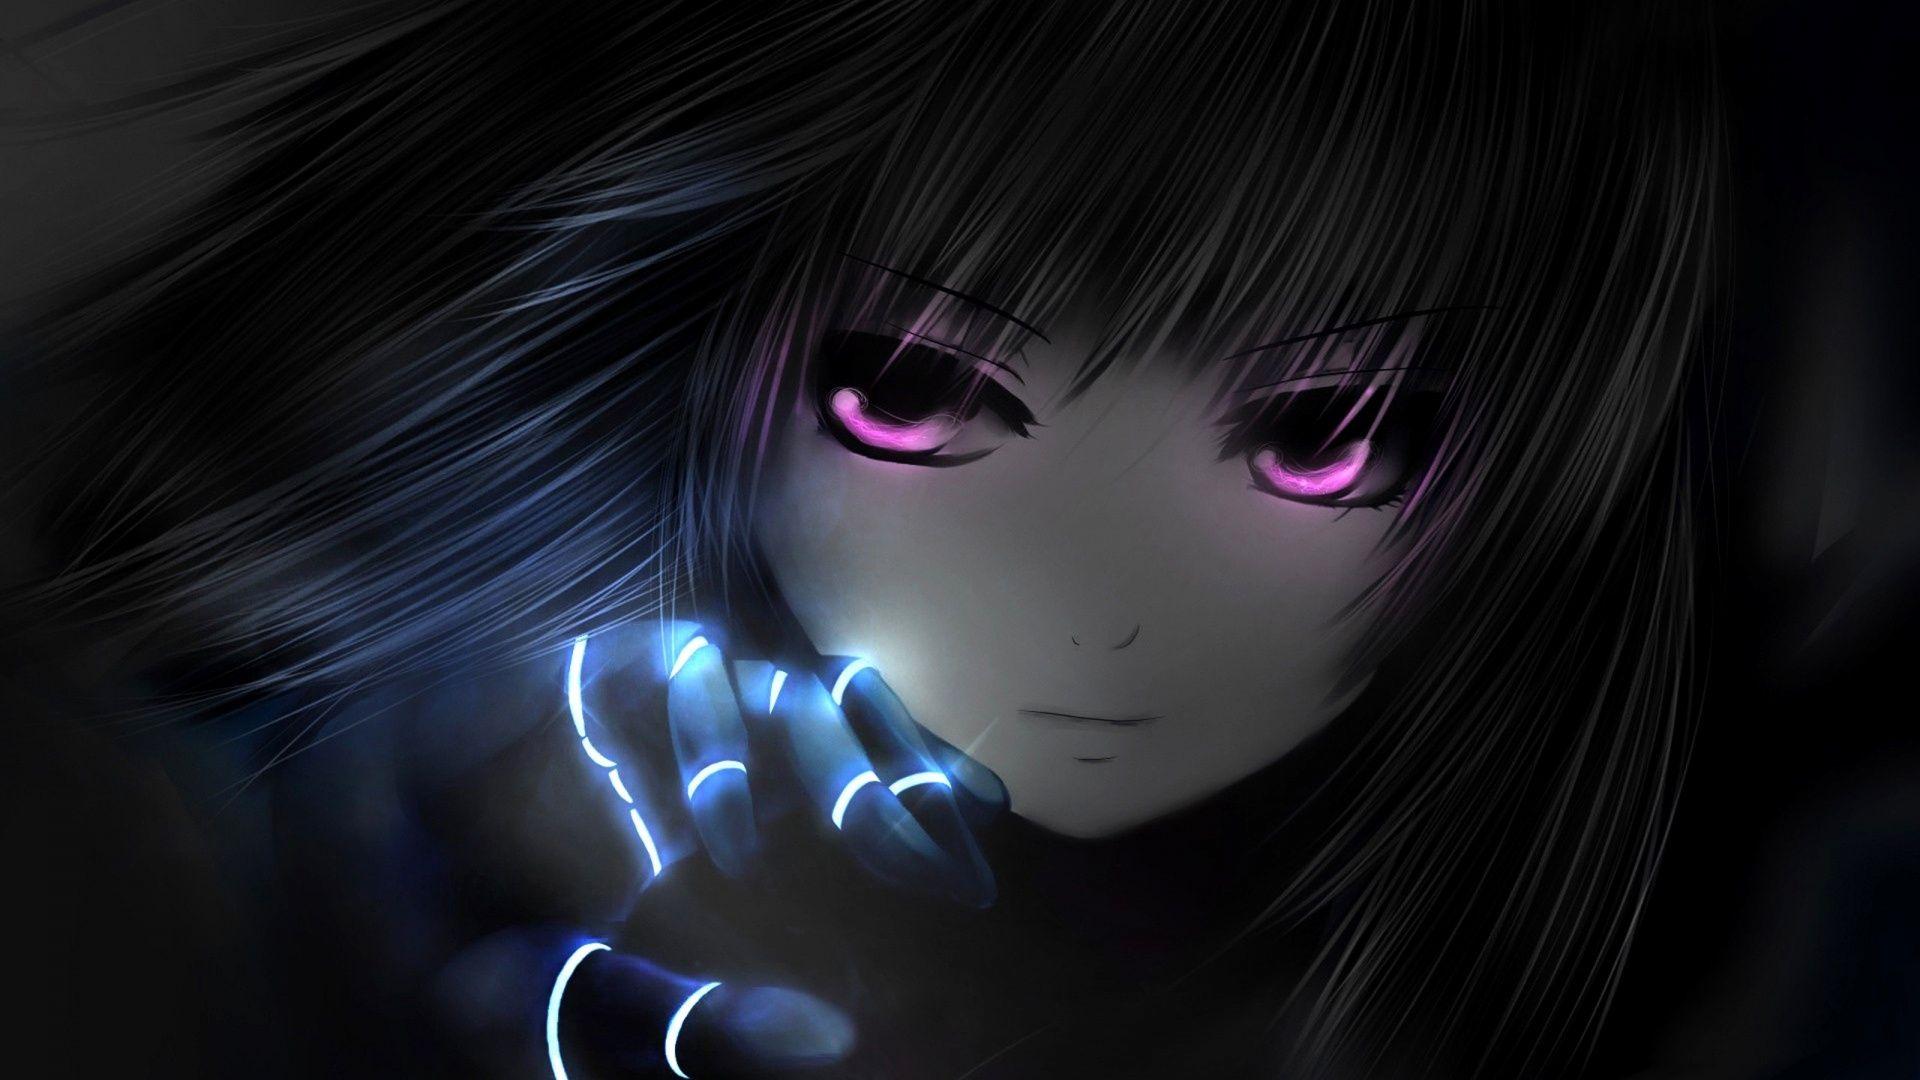 Beautiful Avatars Anime